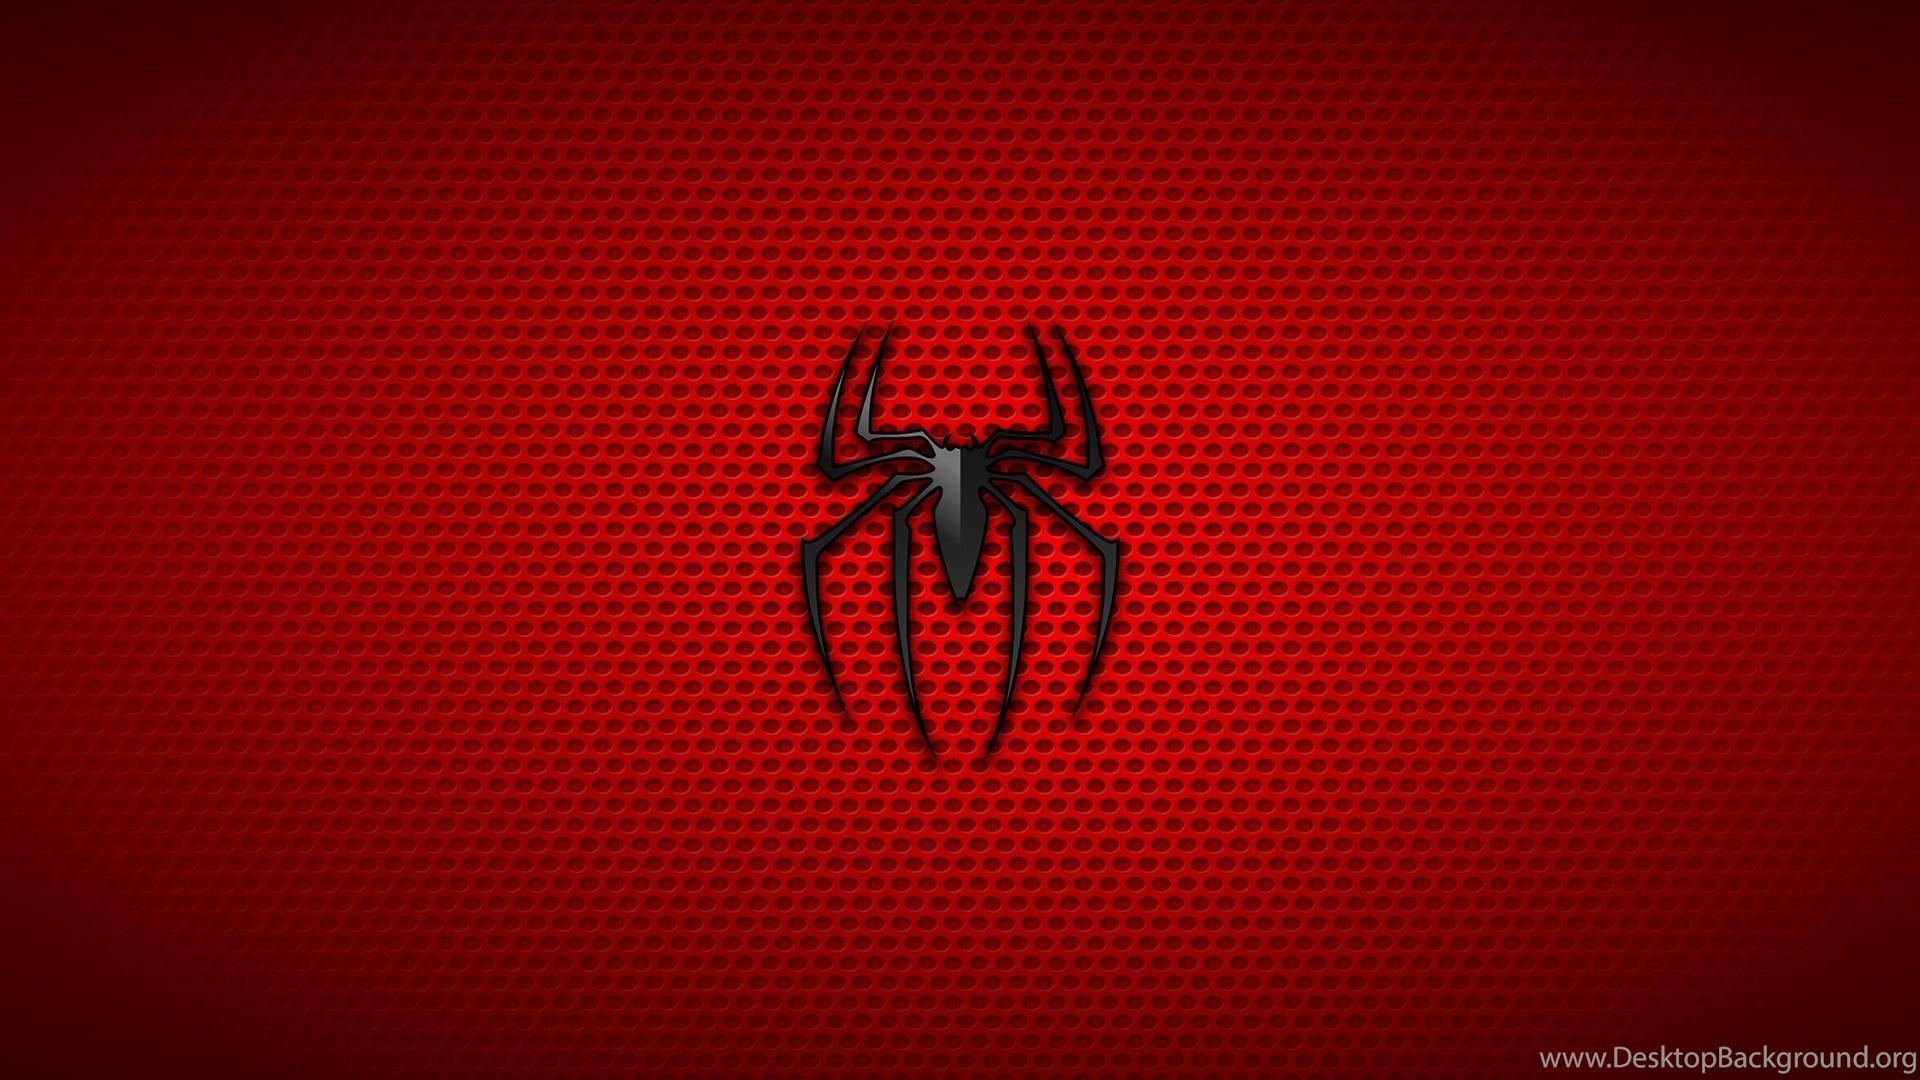 Spiderman Logo Hd Pc Wallpapers 260 Hd Wallpapers Site Desktop